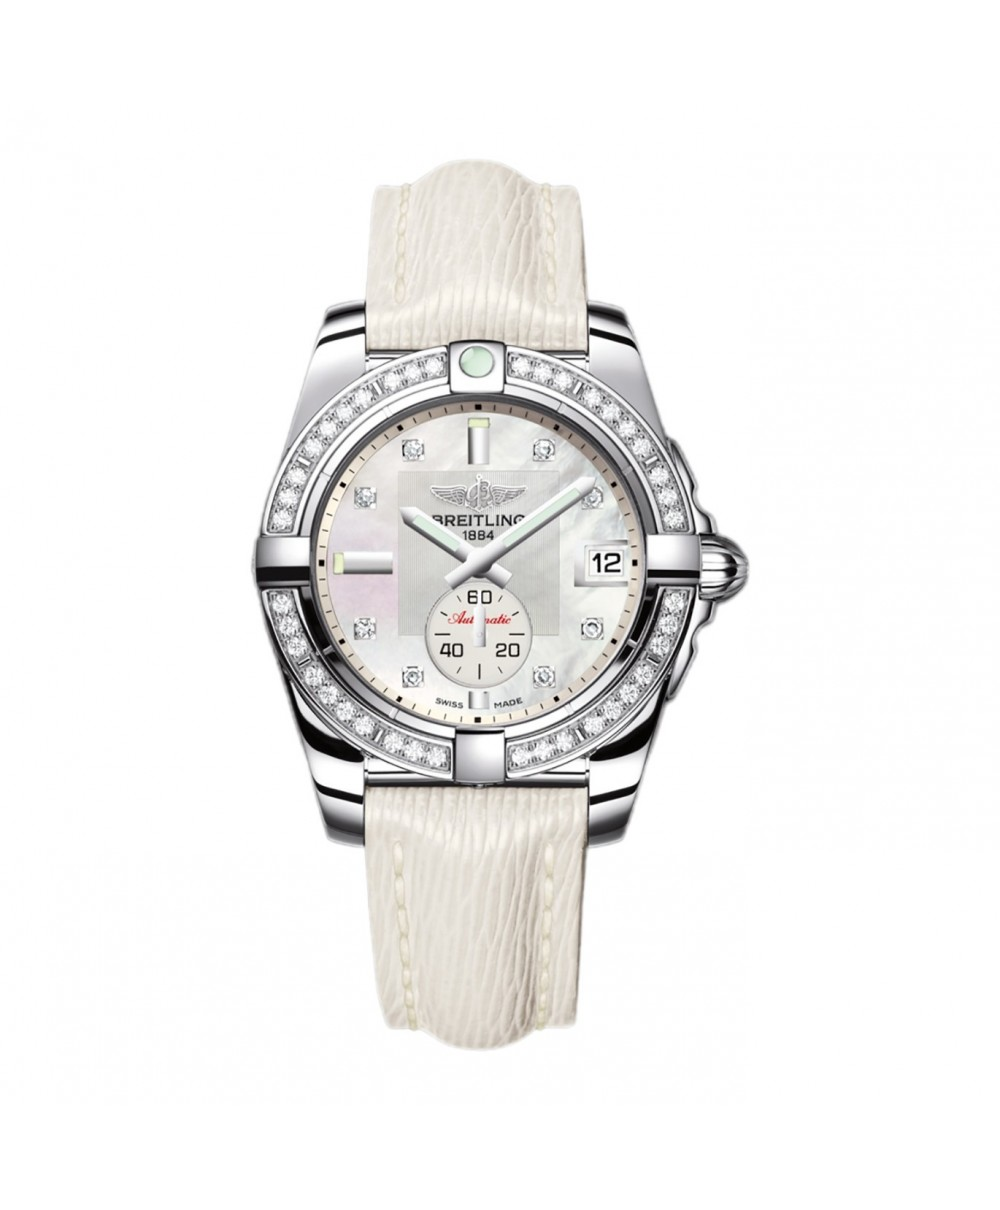 Reloj Breitling Galactic 36 Automatic Blanco